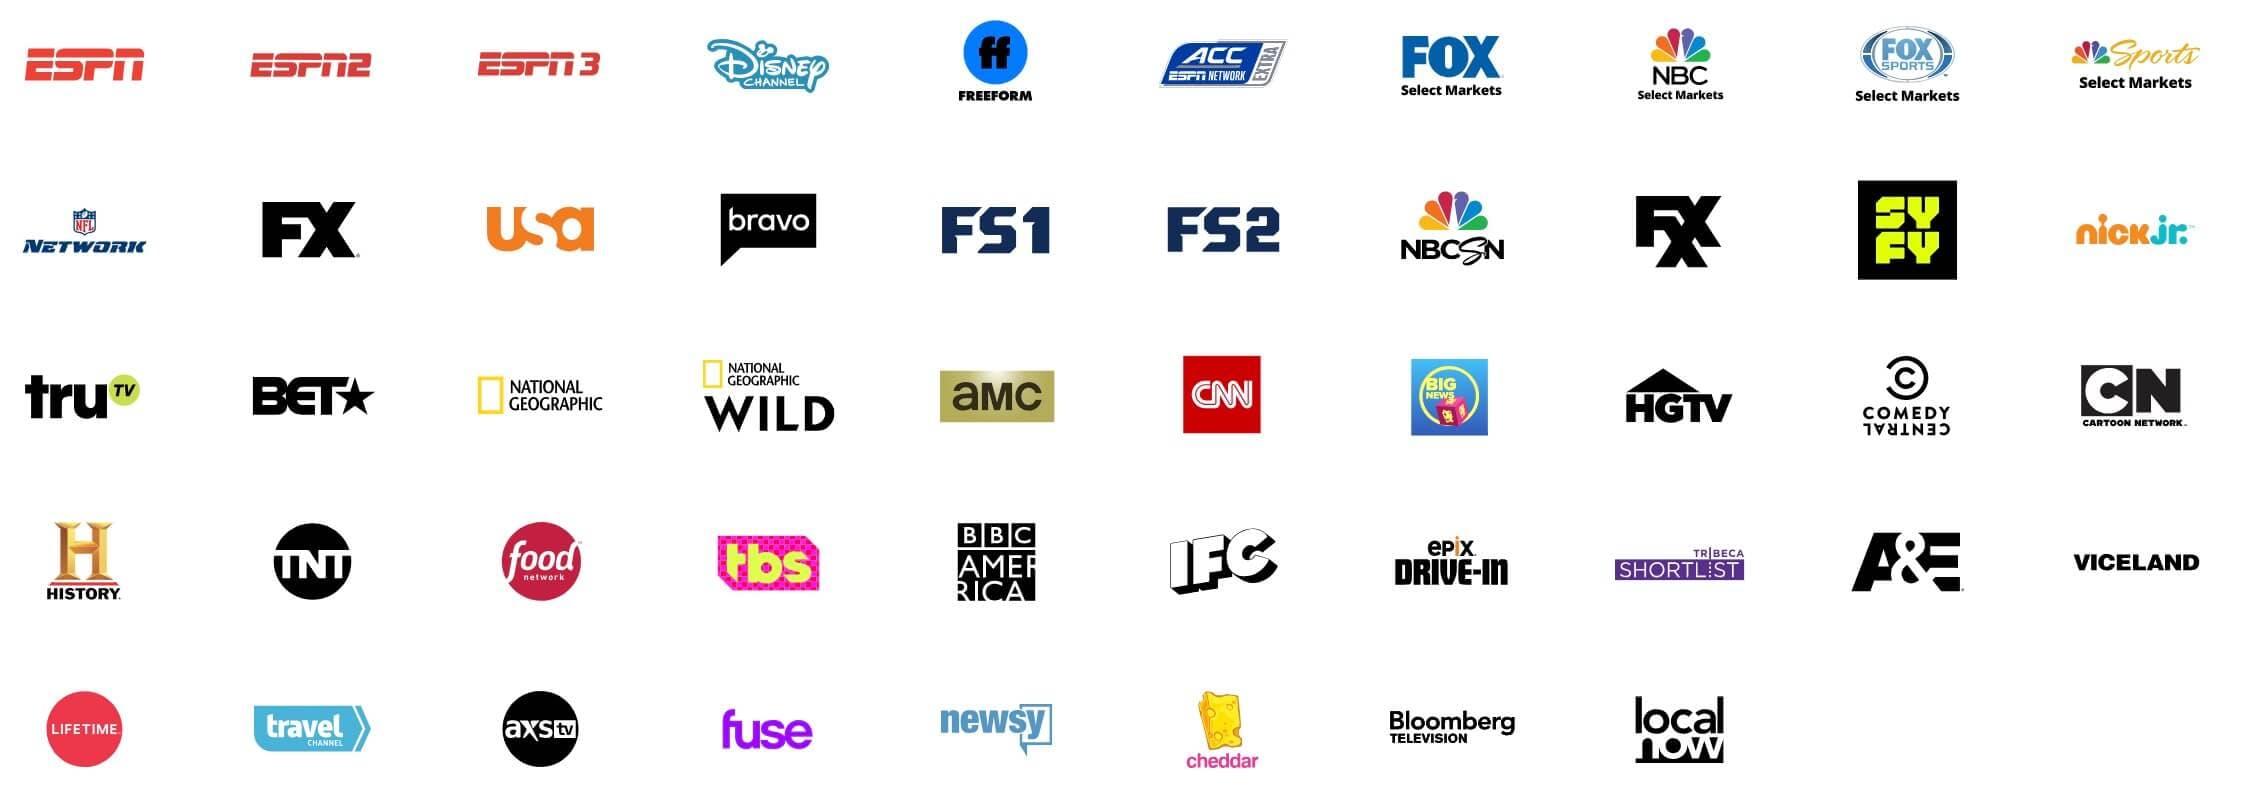 watch nba games live stream sling live tv channels rockets nets